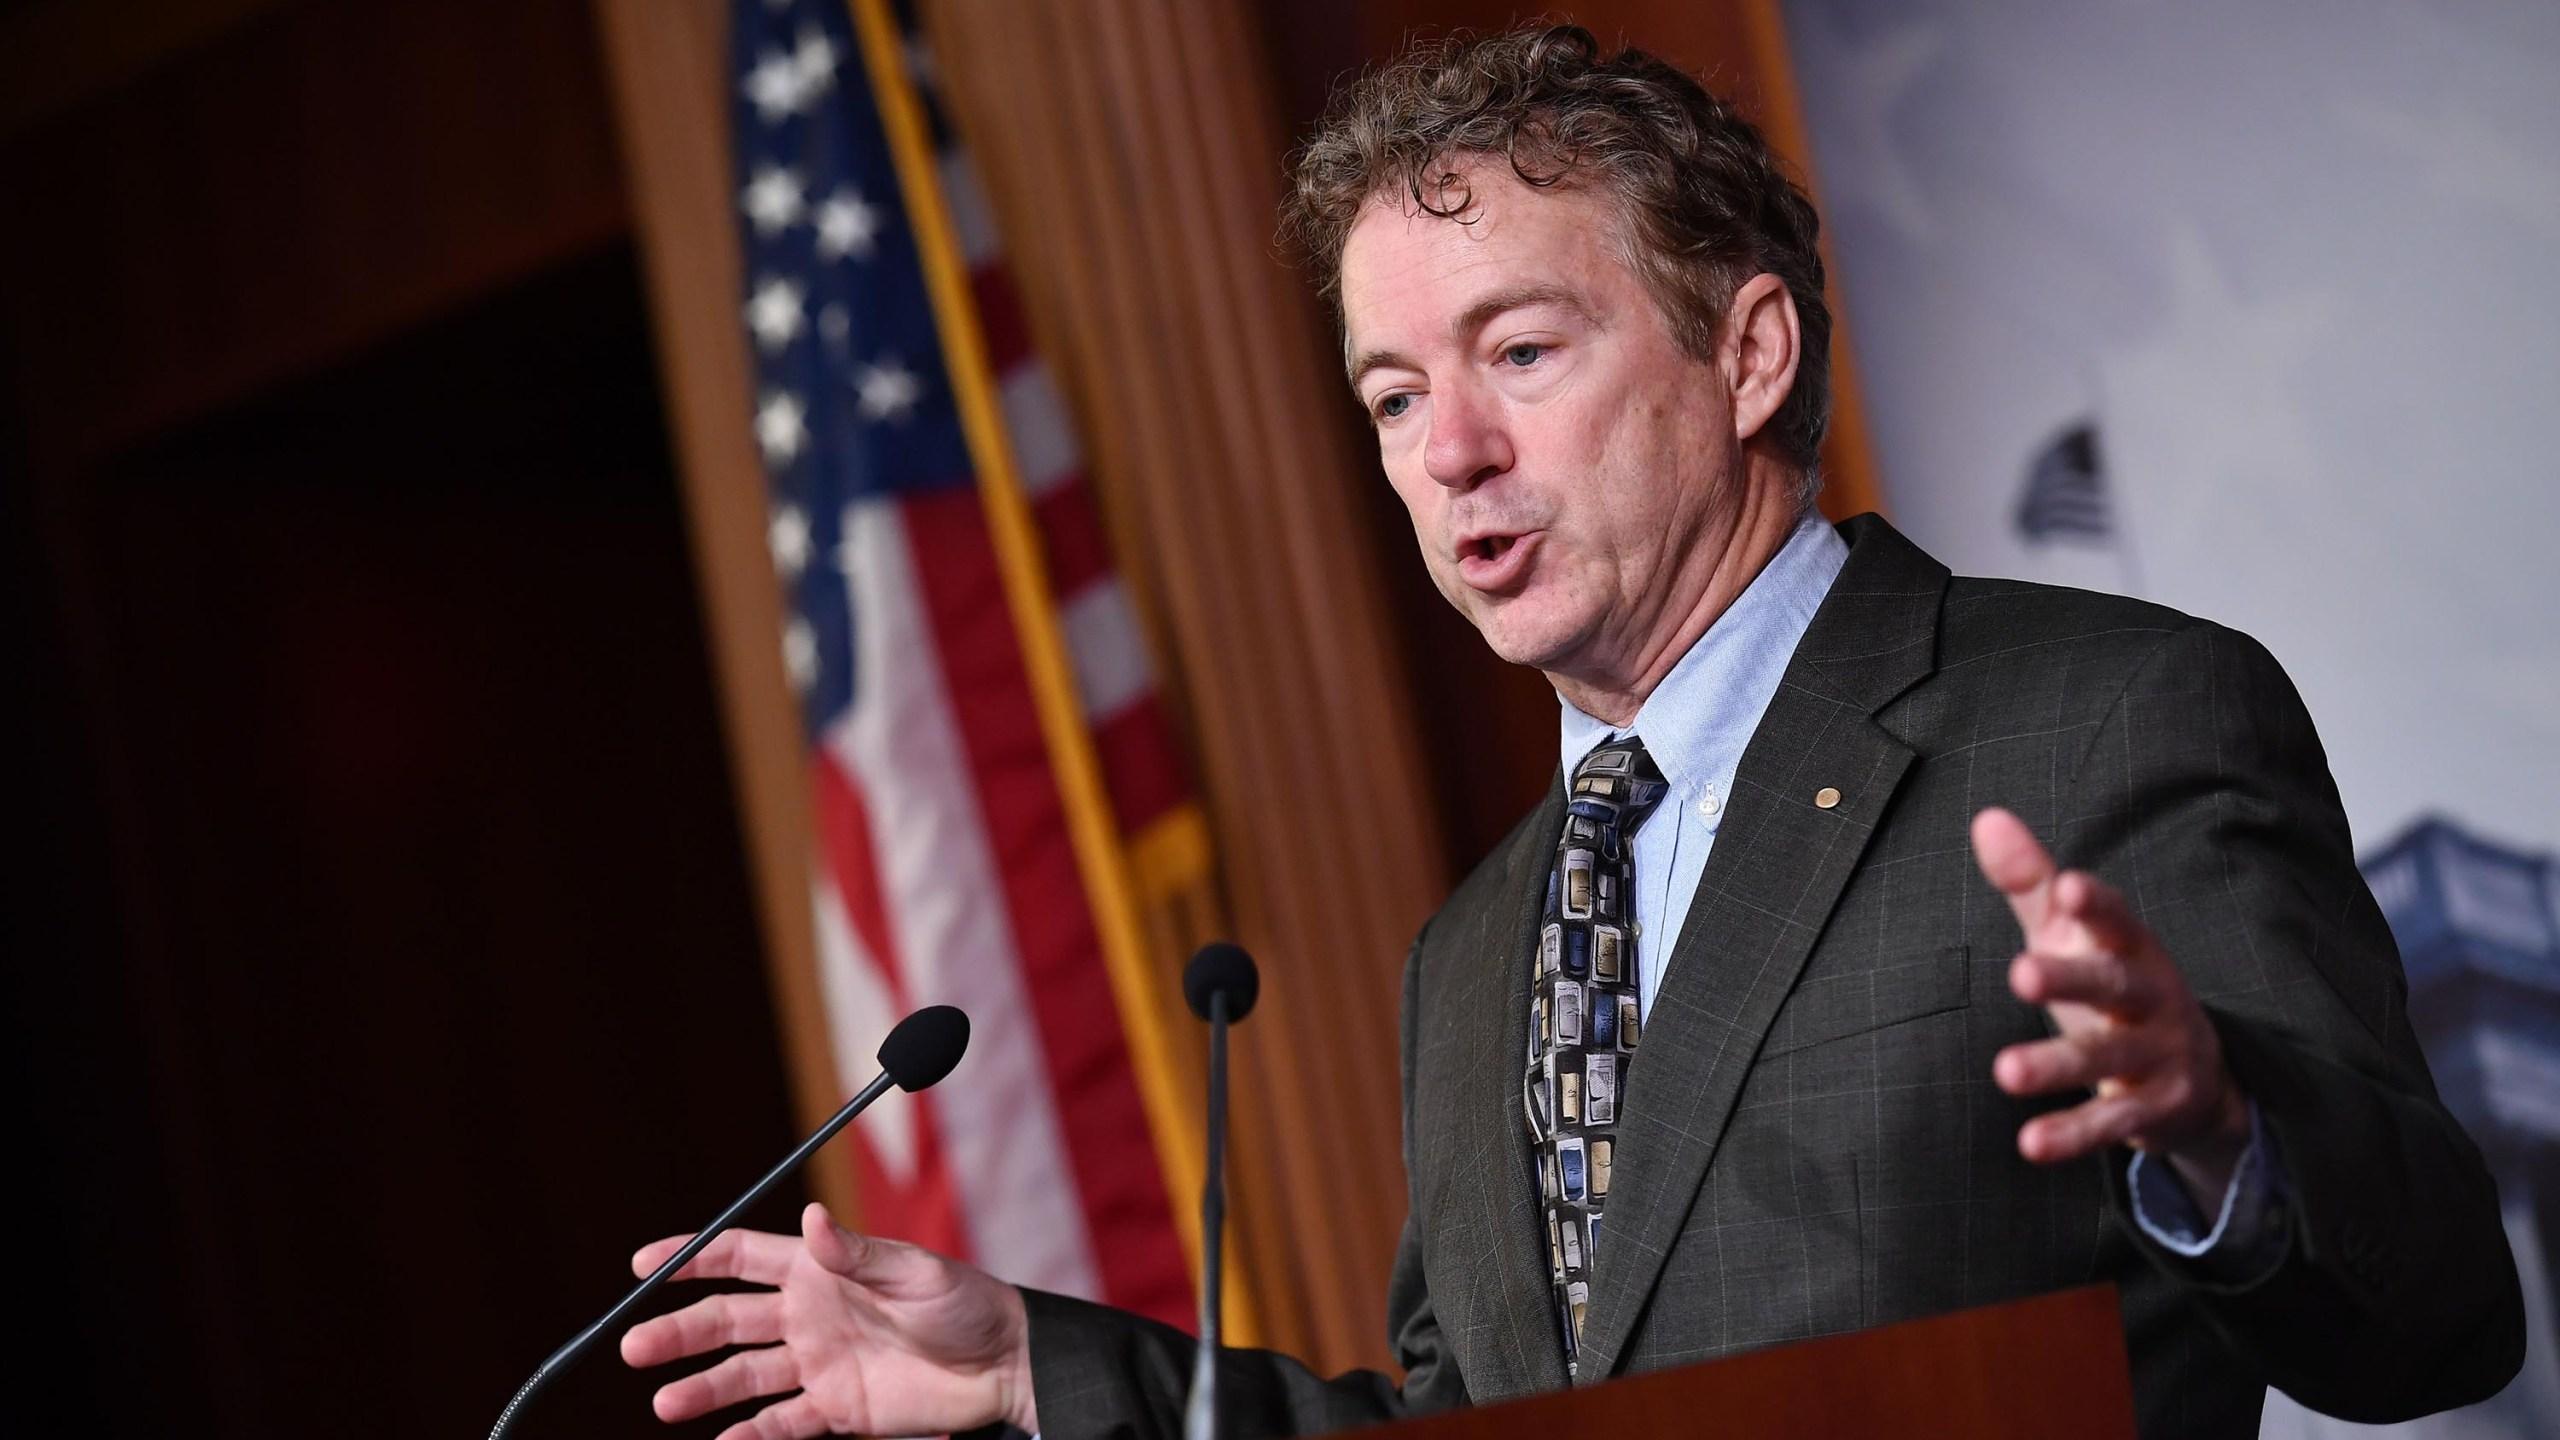 Kentucky senator Rand Paul speaks behind podium